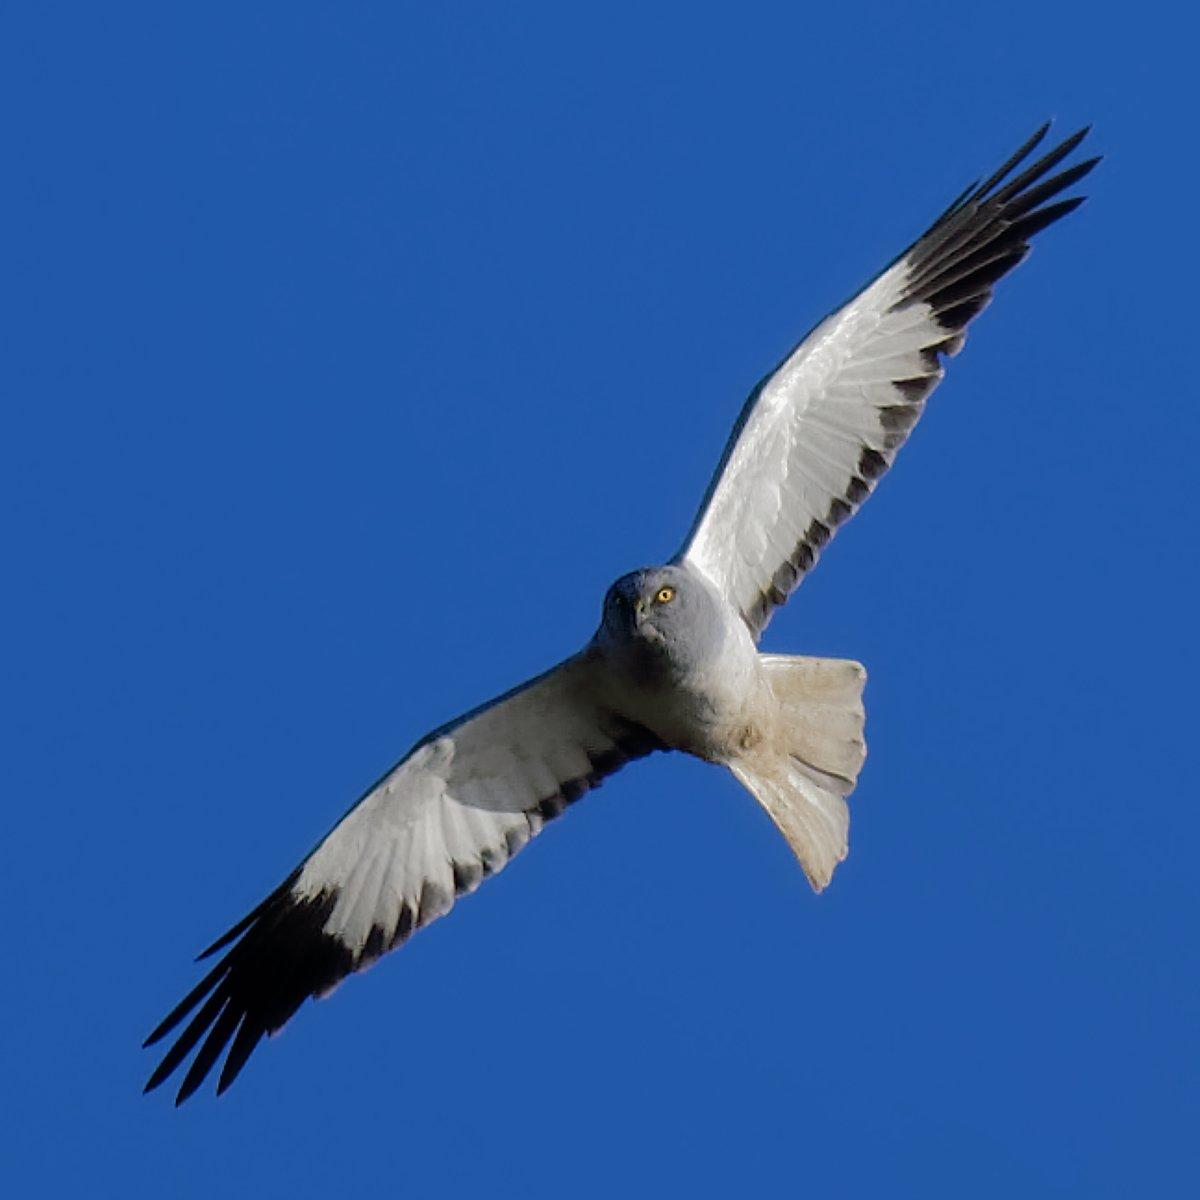 Male Hen Harrier this weekend #isleofman @RSPB_Skydancer<br>http://pic.twitter.com/kdoIiydlDg